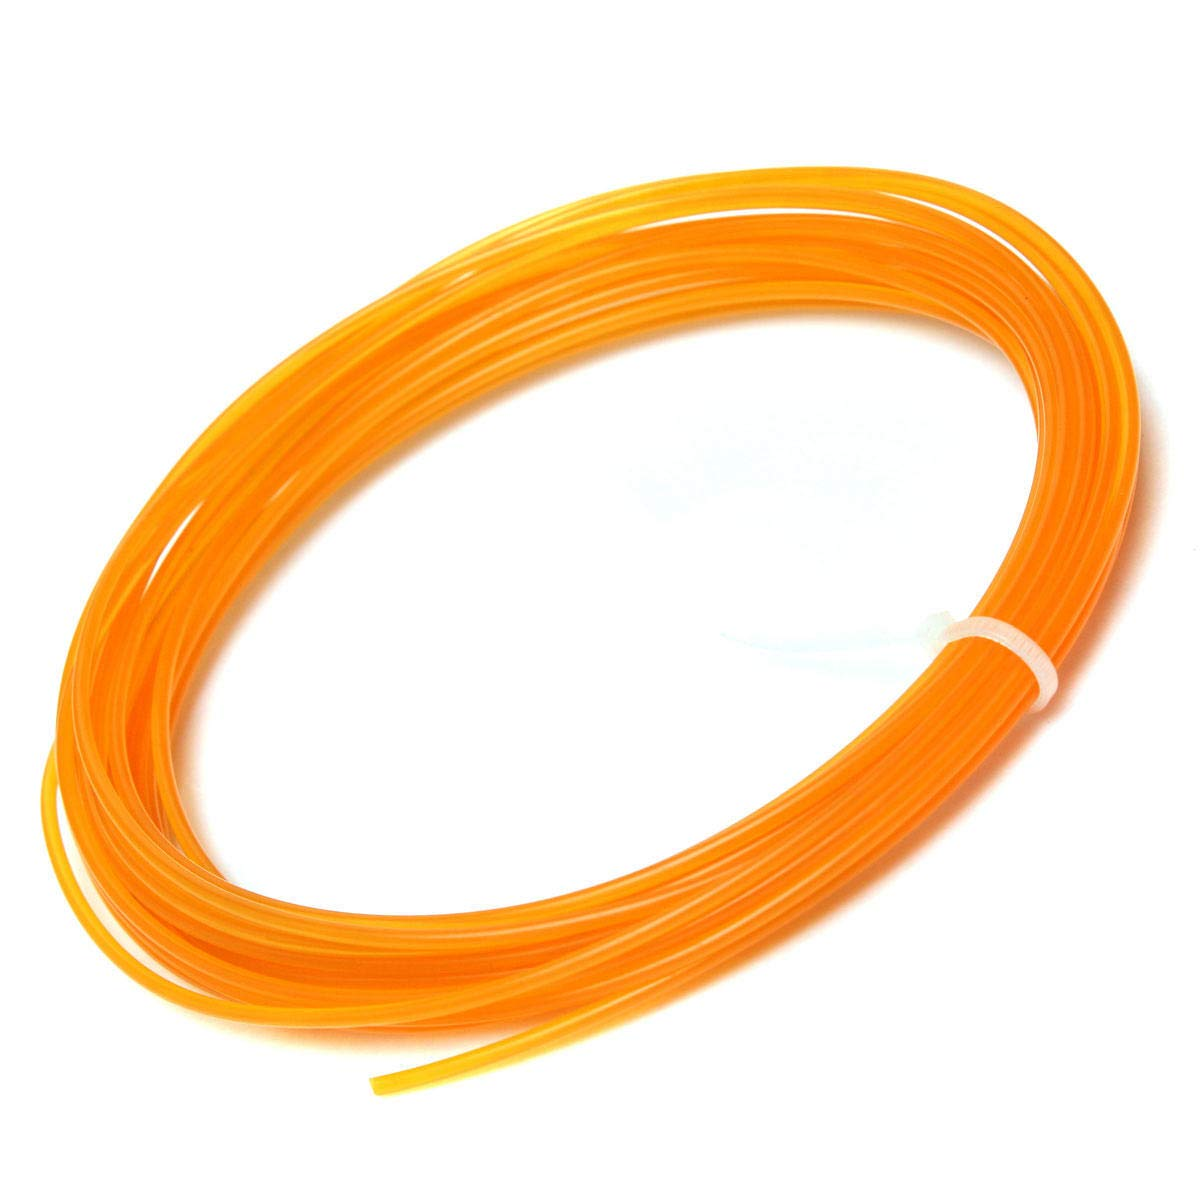 ExcLent 5 Meter 1.75Mm Pla 3D Printer Filament For Mendel ...